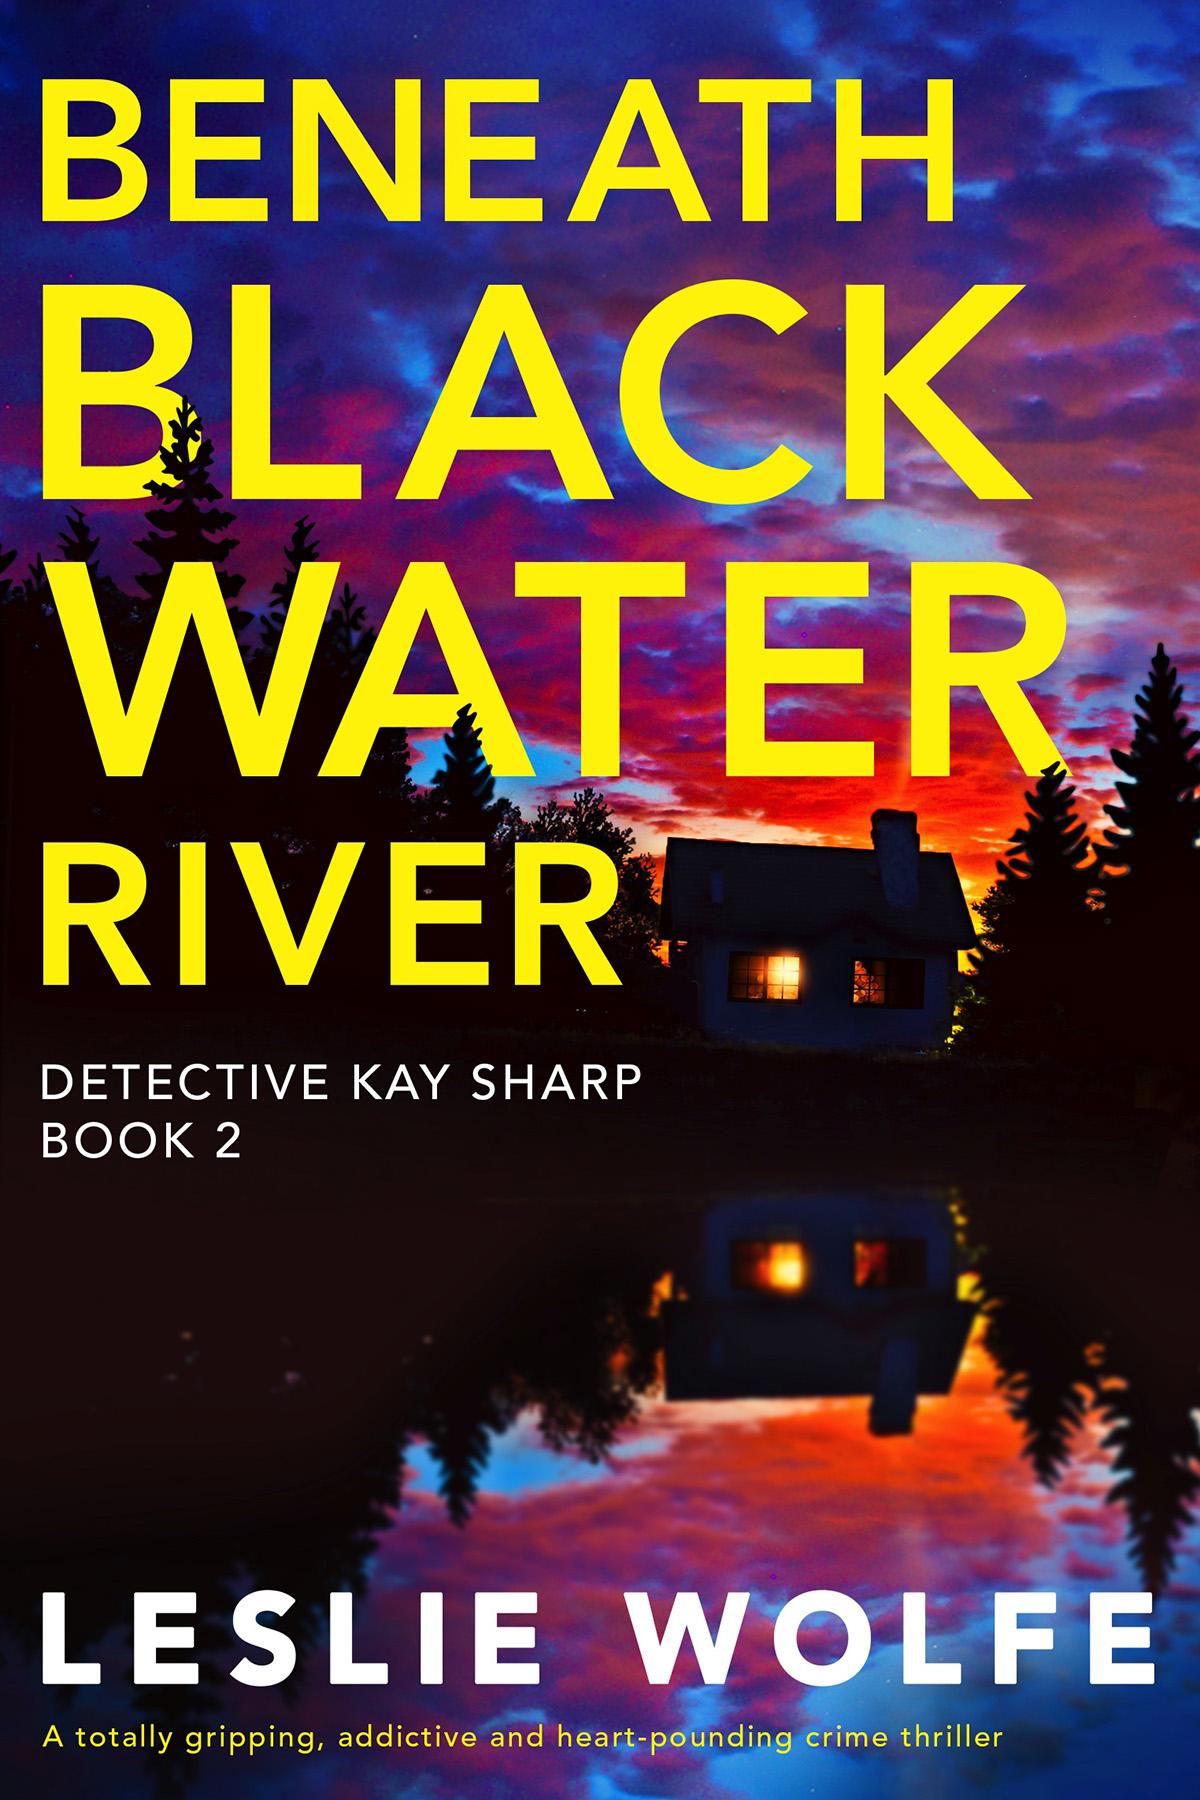 Beneath Black Water River by Leslie Wolfe